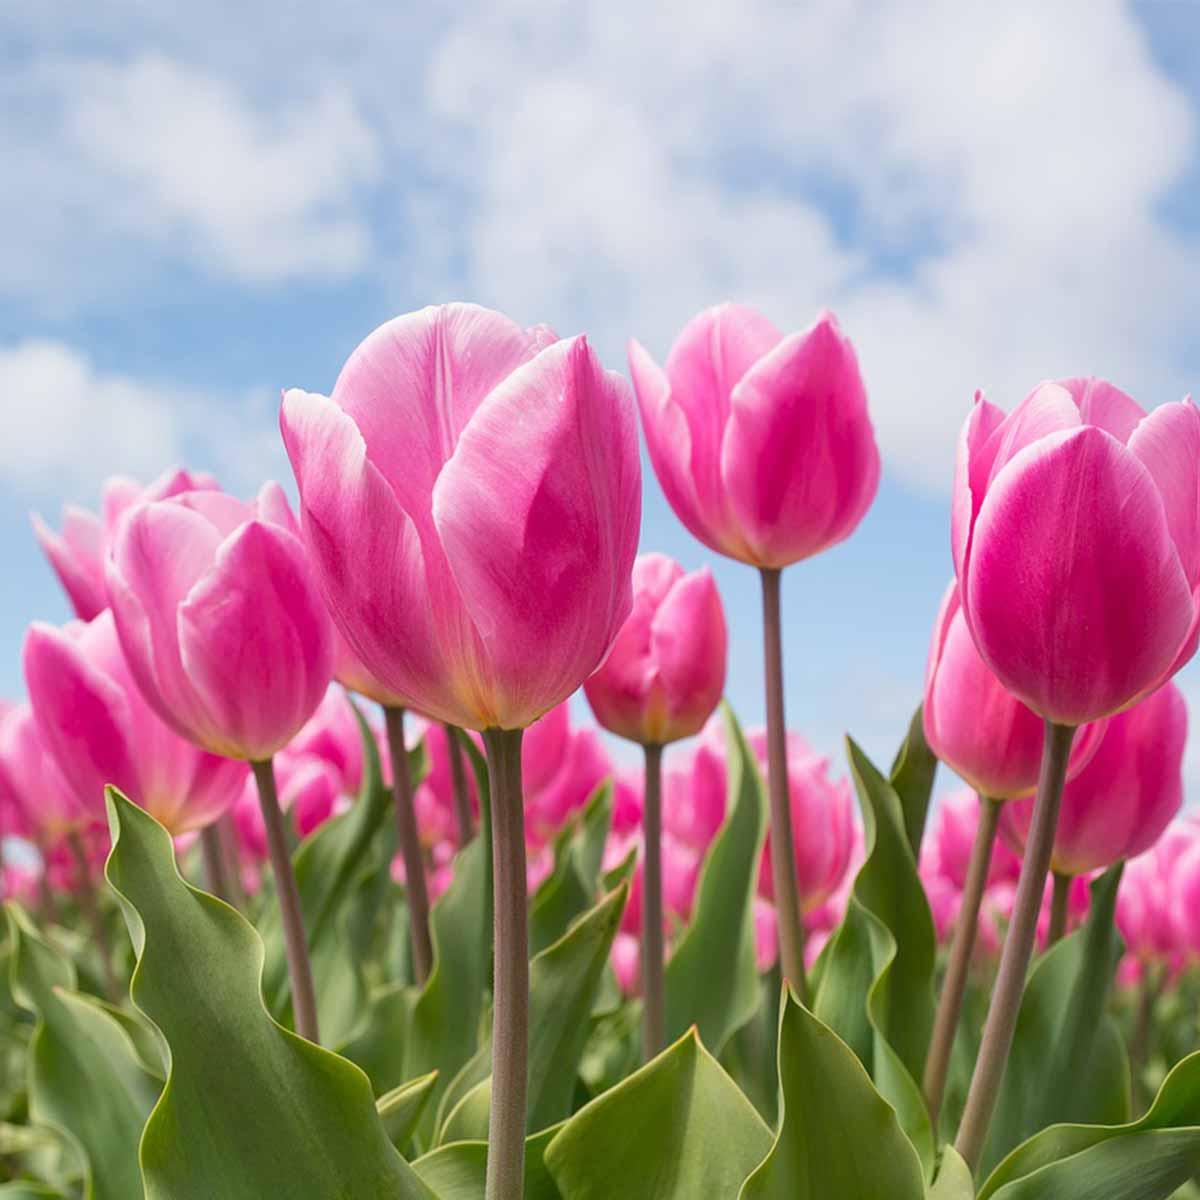 Mejores plantas para San Valentín - Tulipán